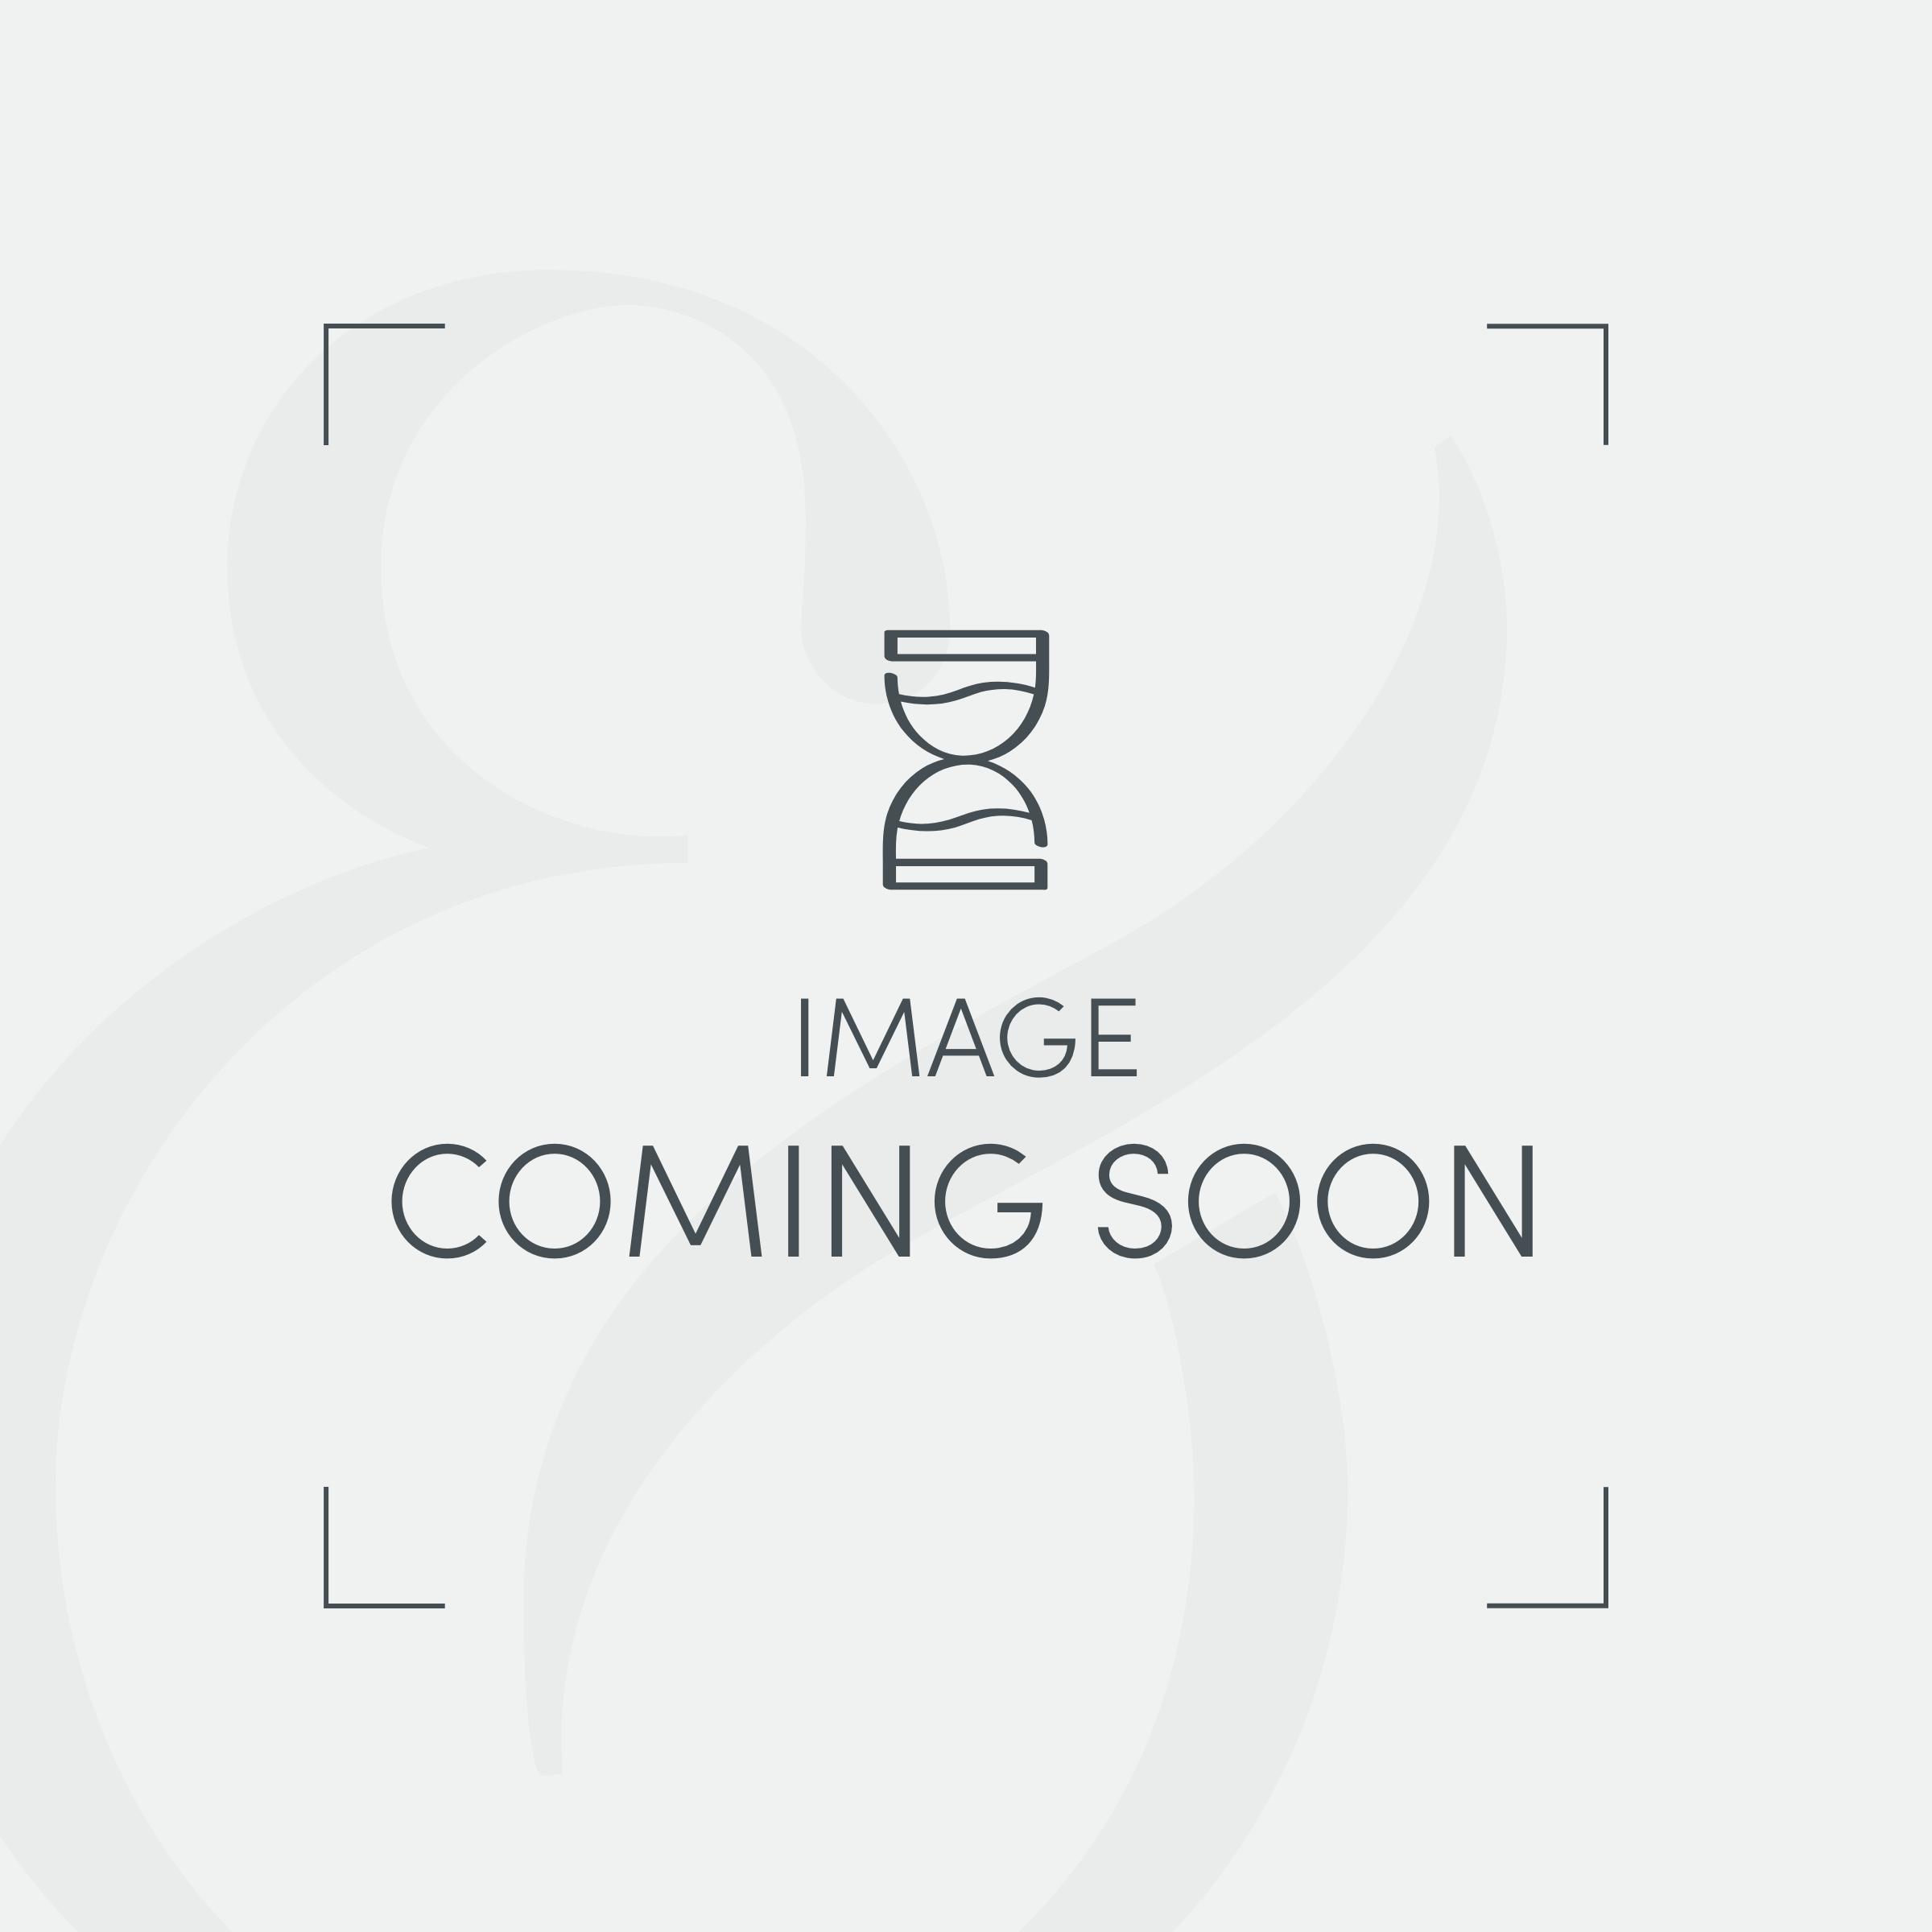 Dusky Blue Luxury Egyptian Cotton Towel Bale